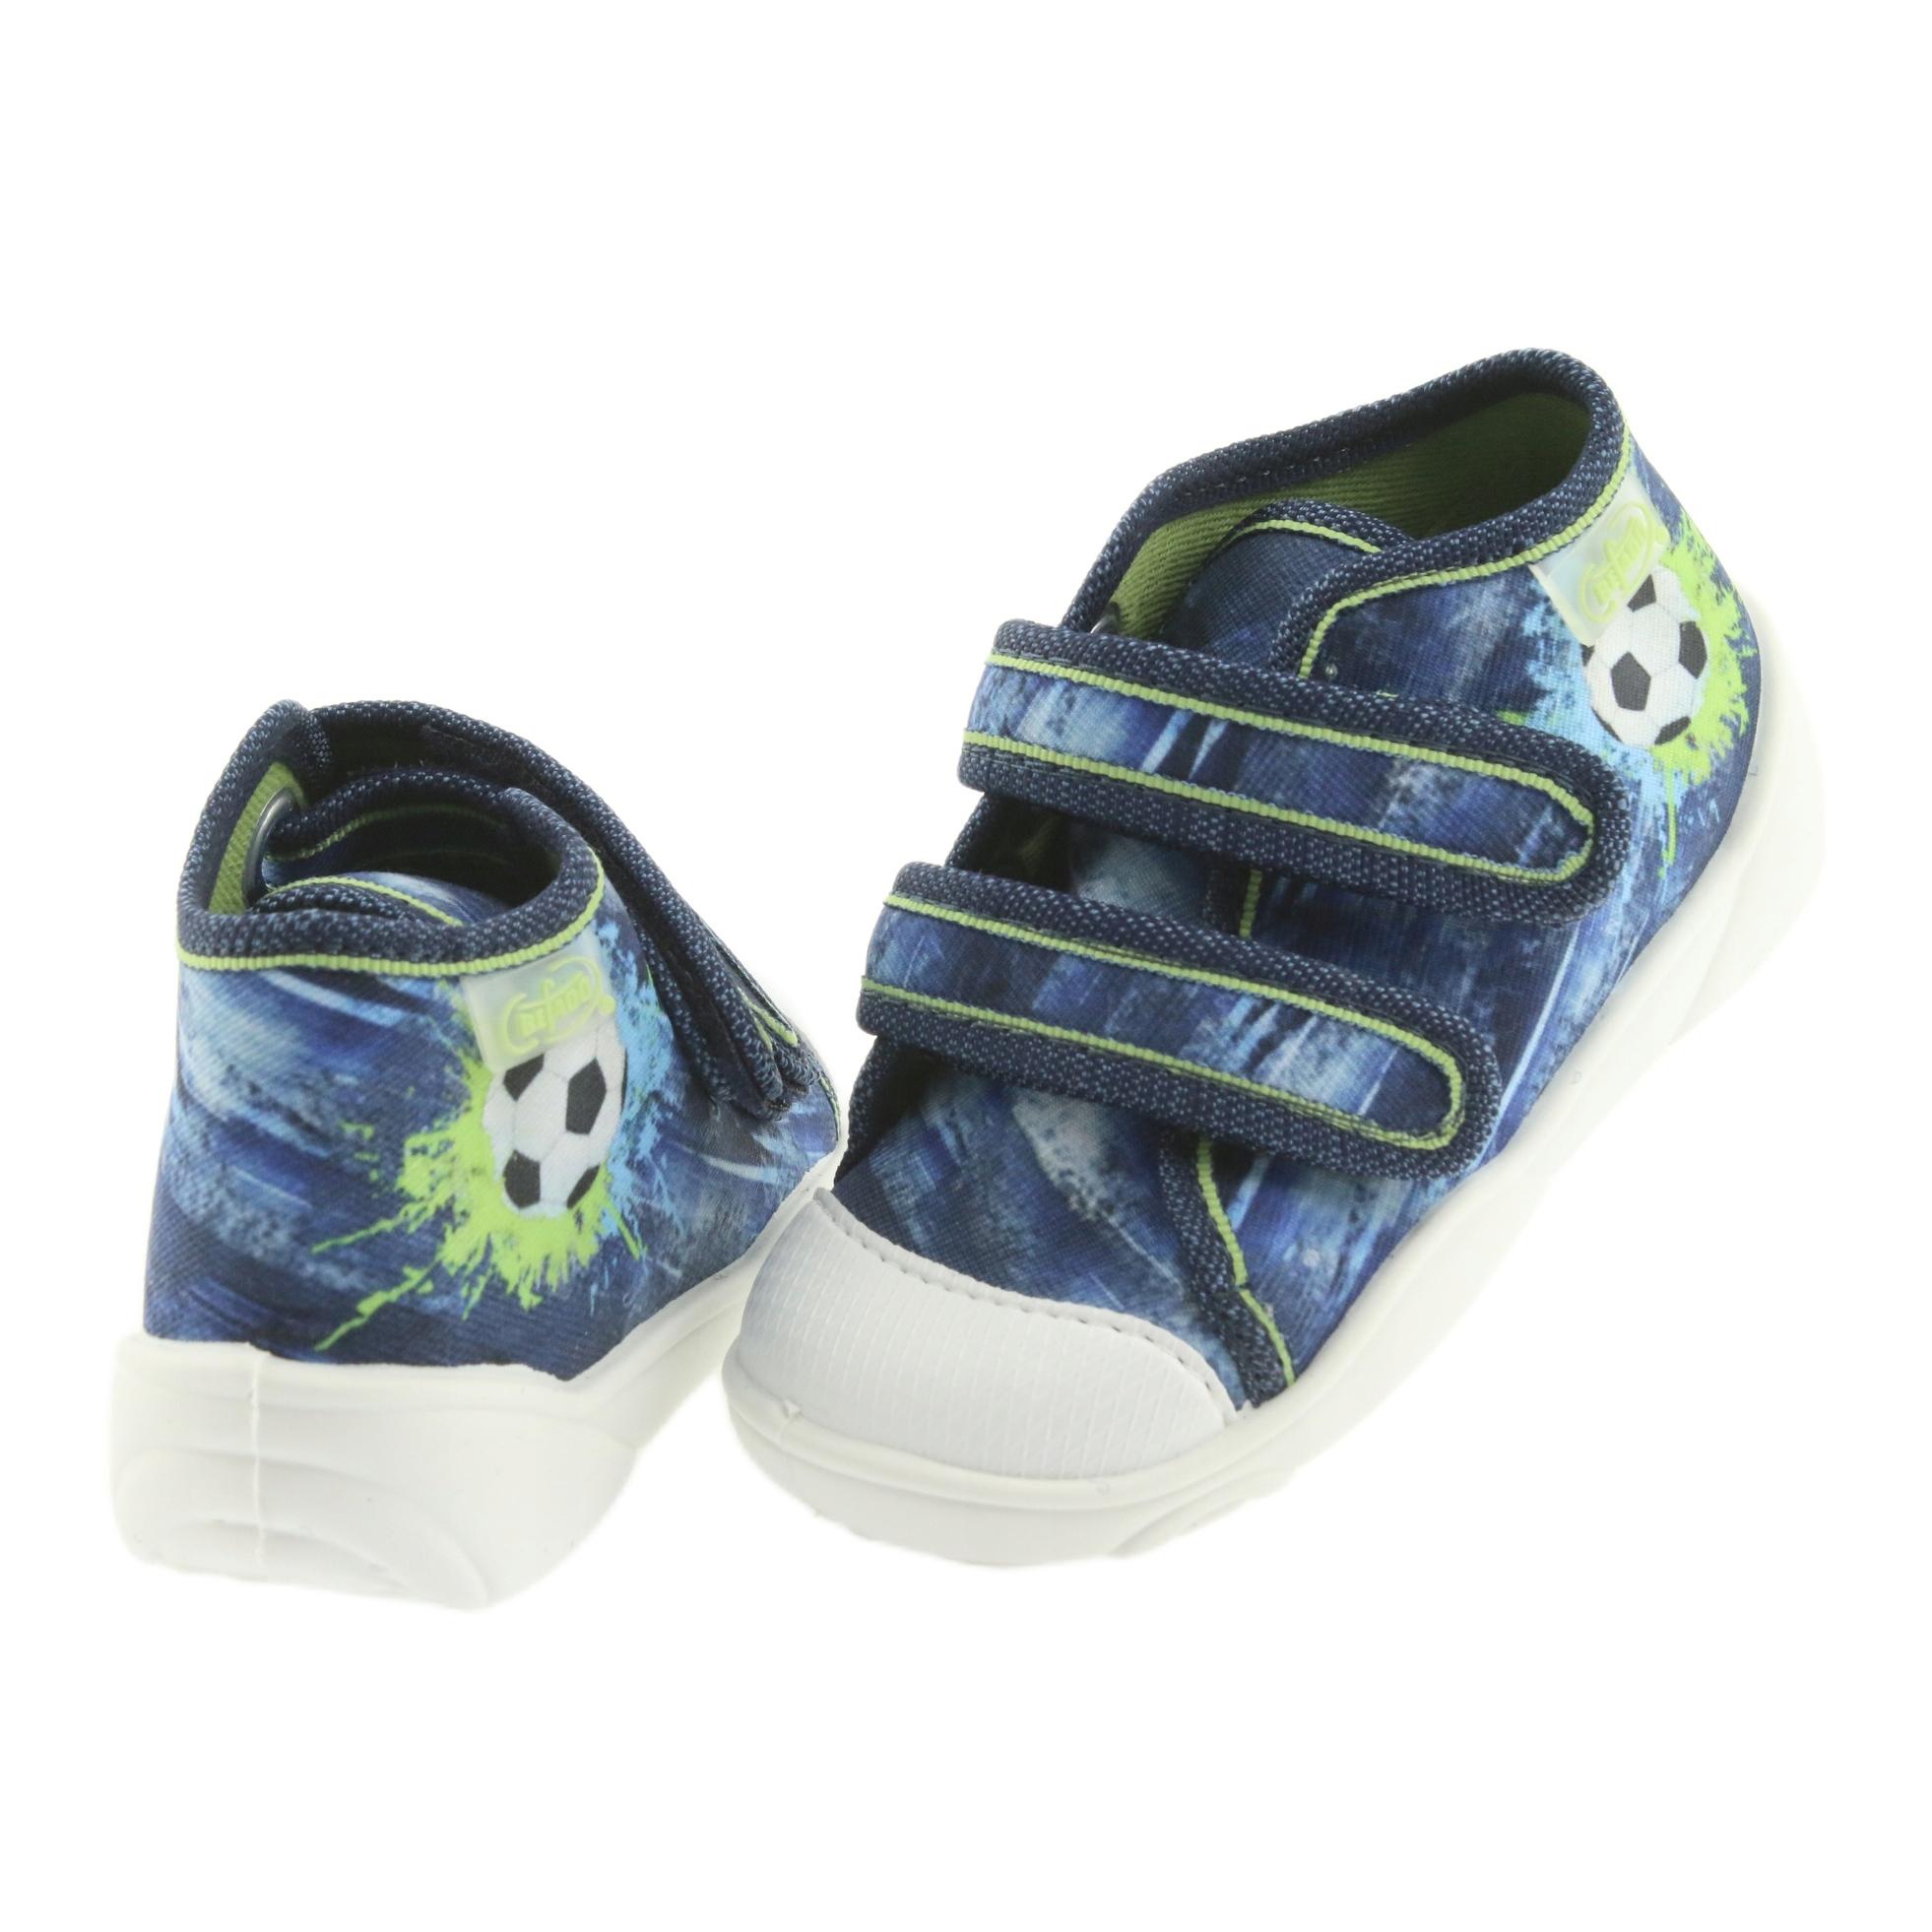 miniatura 5 - Scarpe da calcio per bambini Befado 212P058 blu verde marina